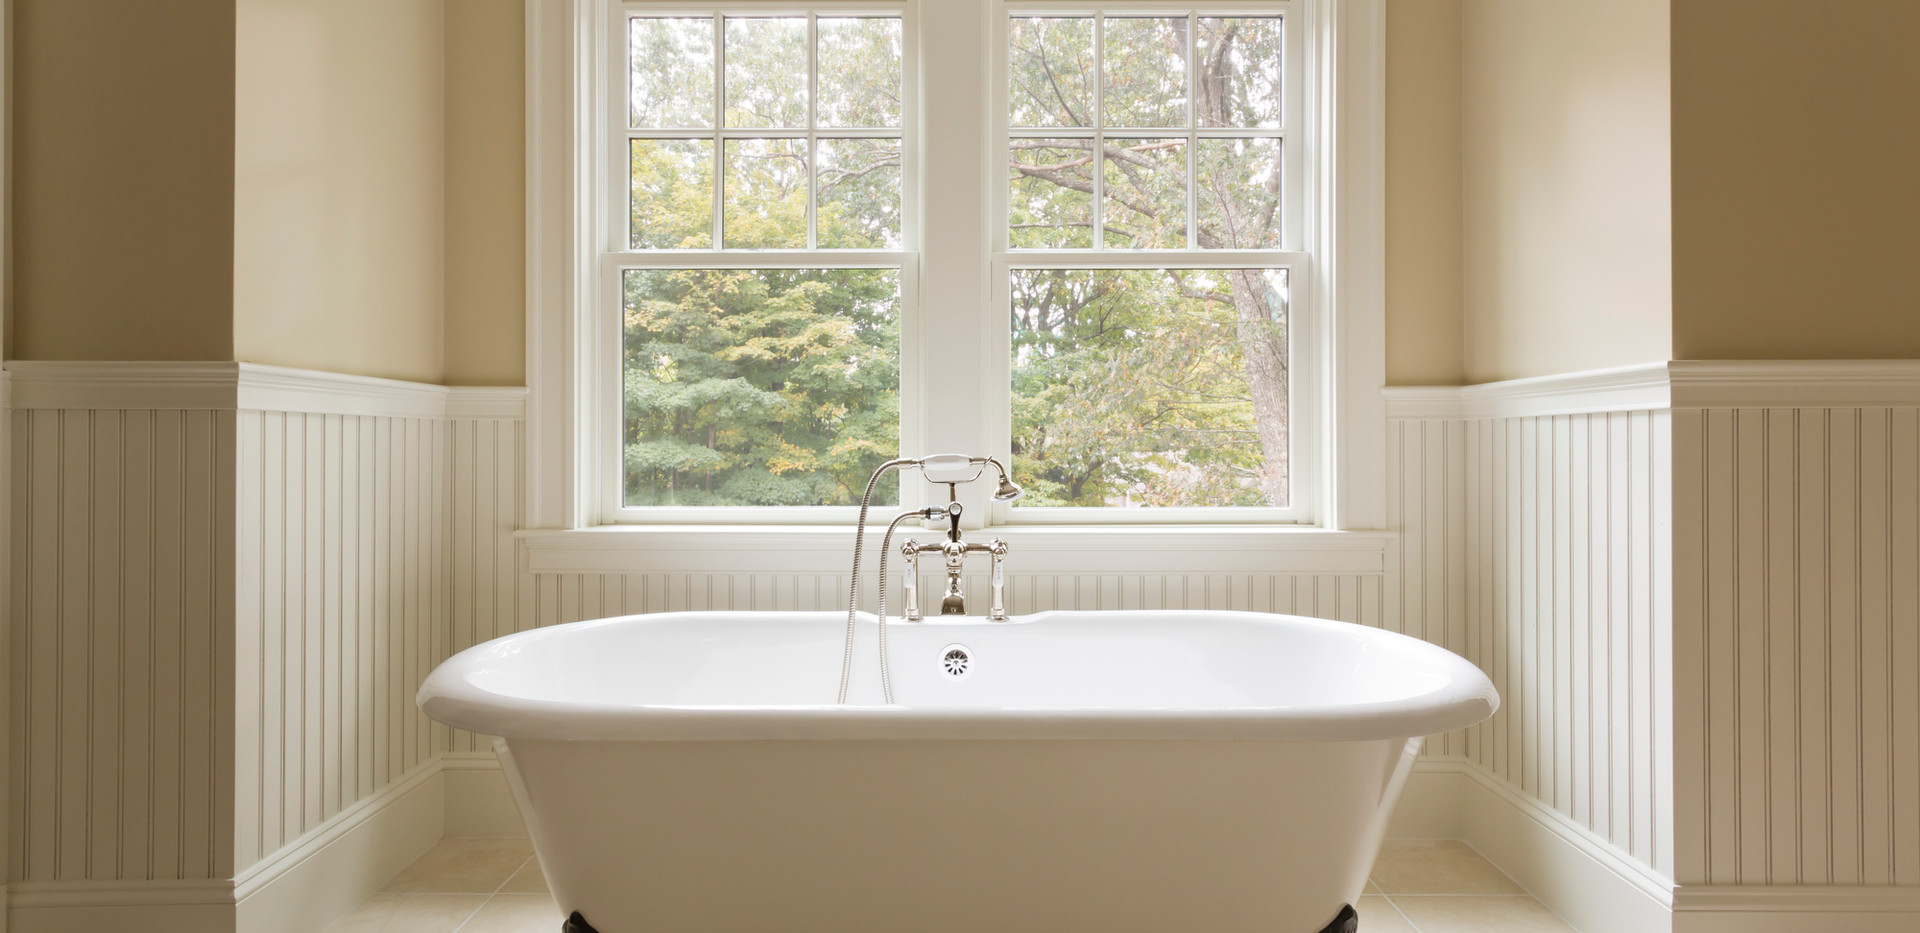 Hermoso baño